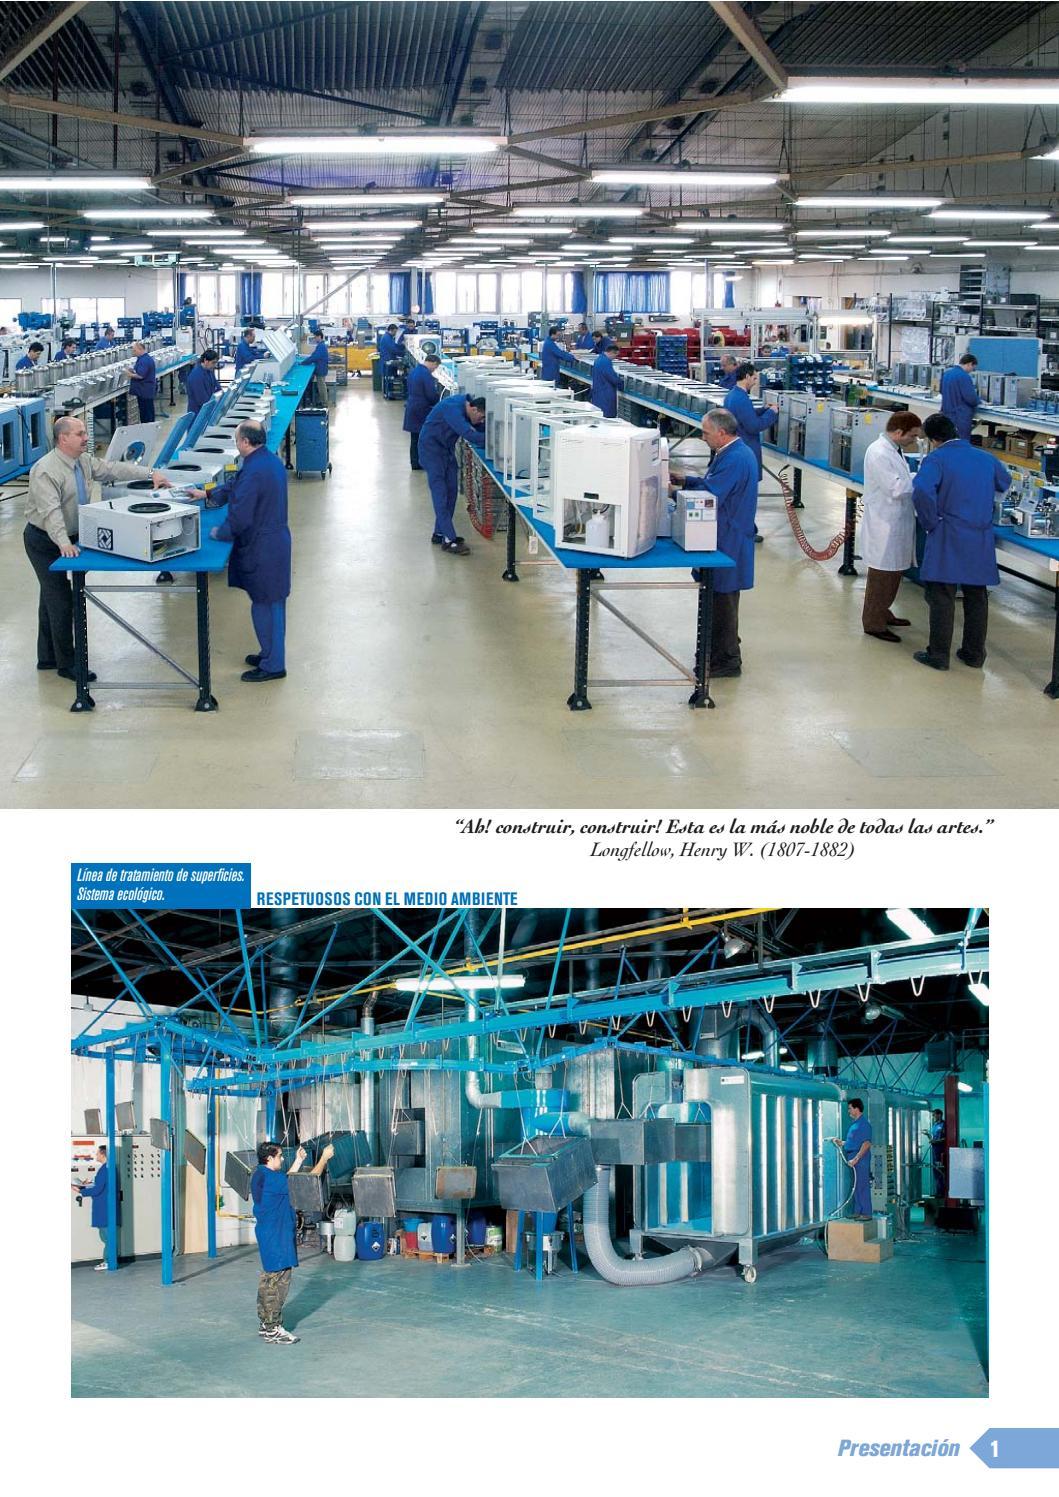 530 Longitud De Aluminio Compresor De Aire Reemplazo de Tubo de escape de tono plata